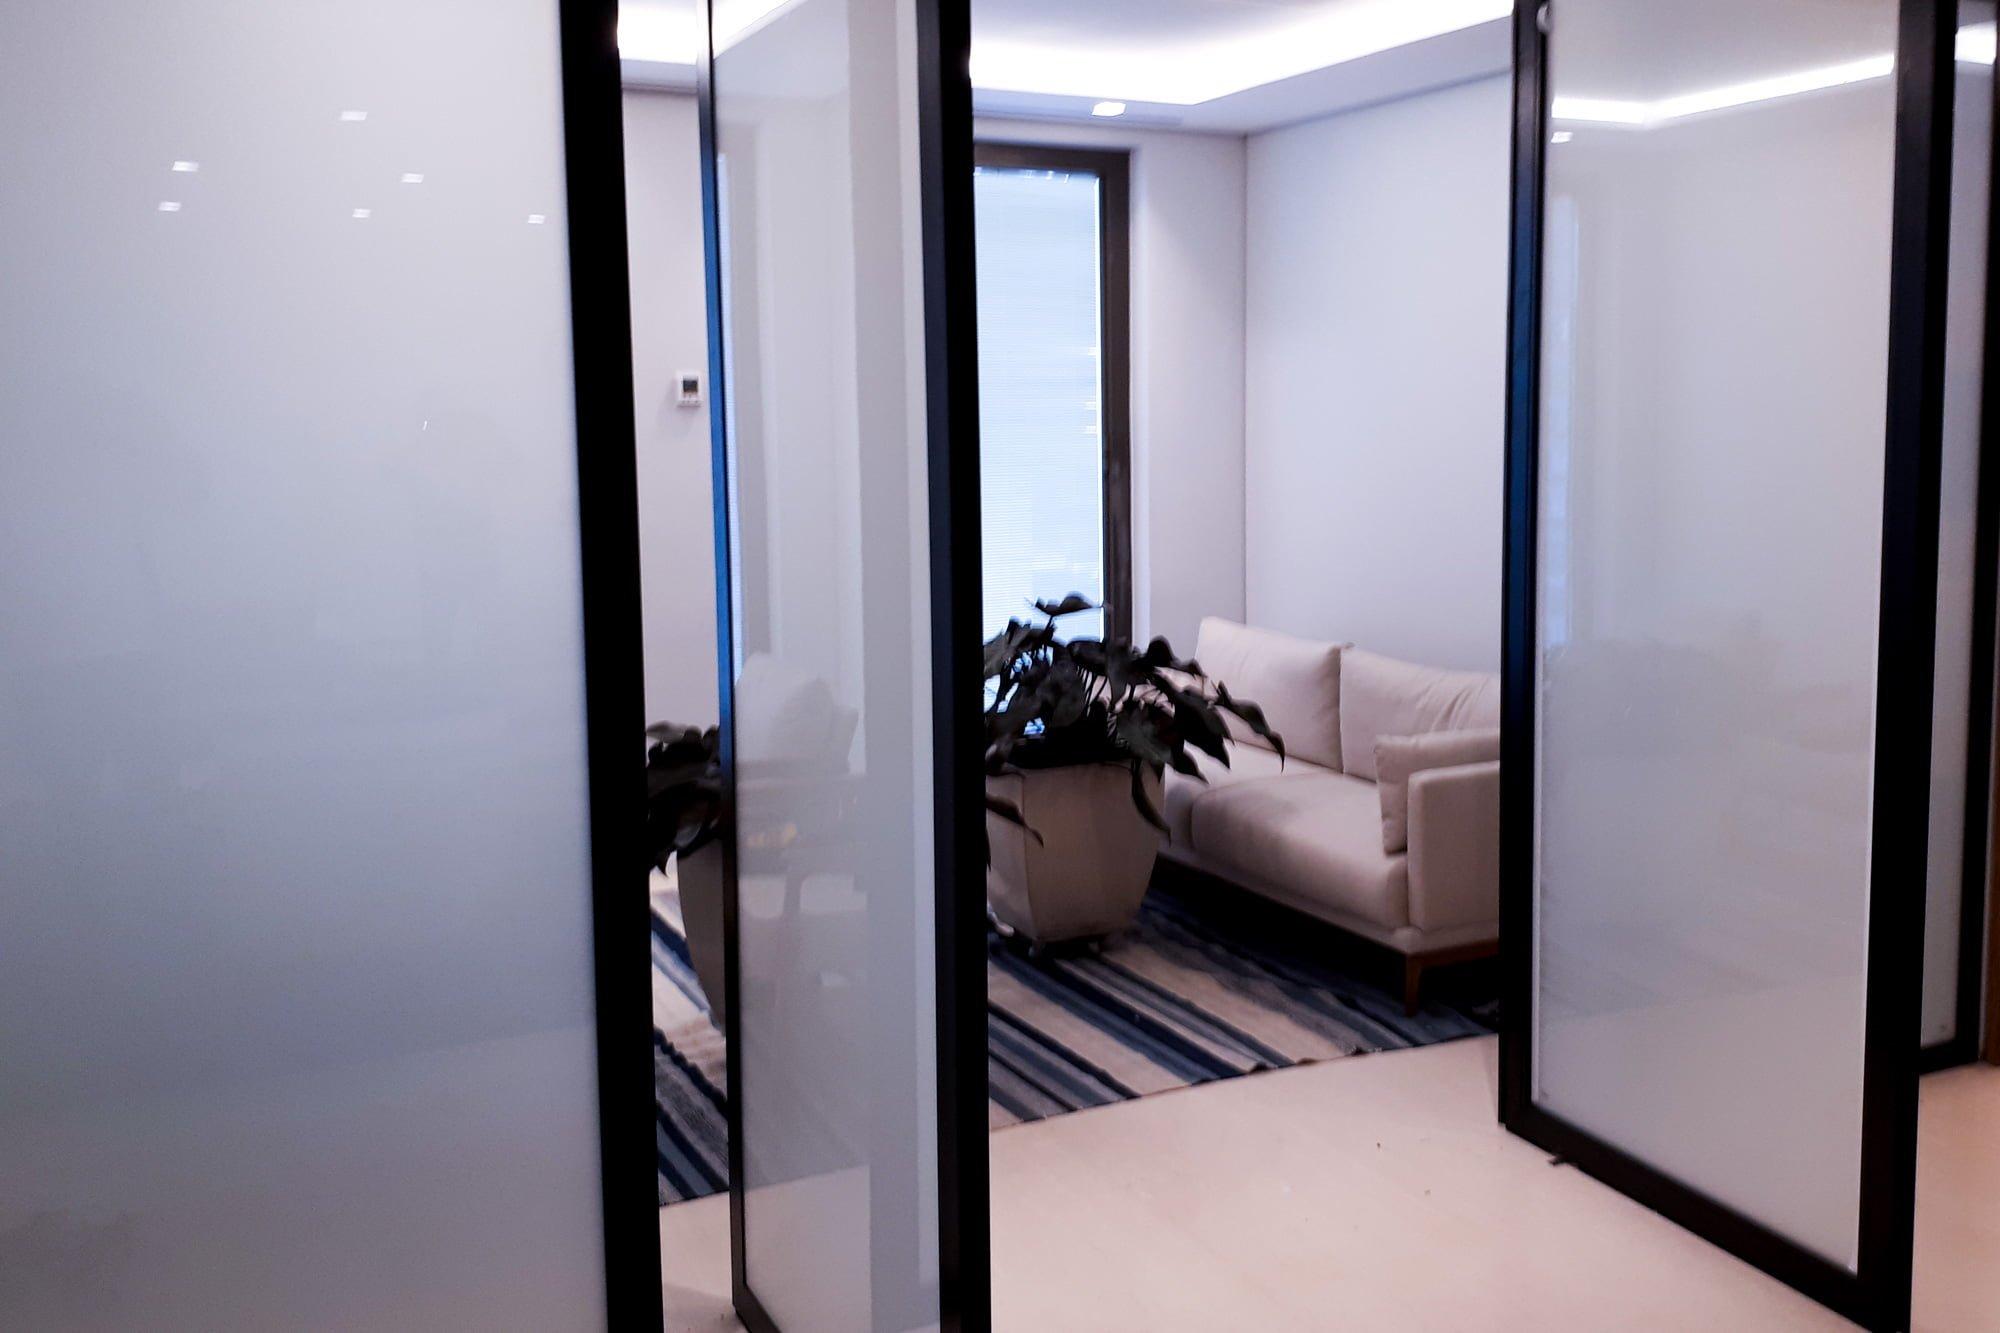 porta com vidro polarizado desligado